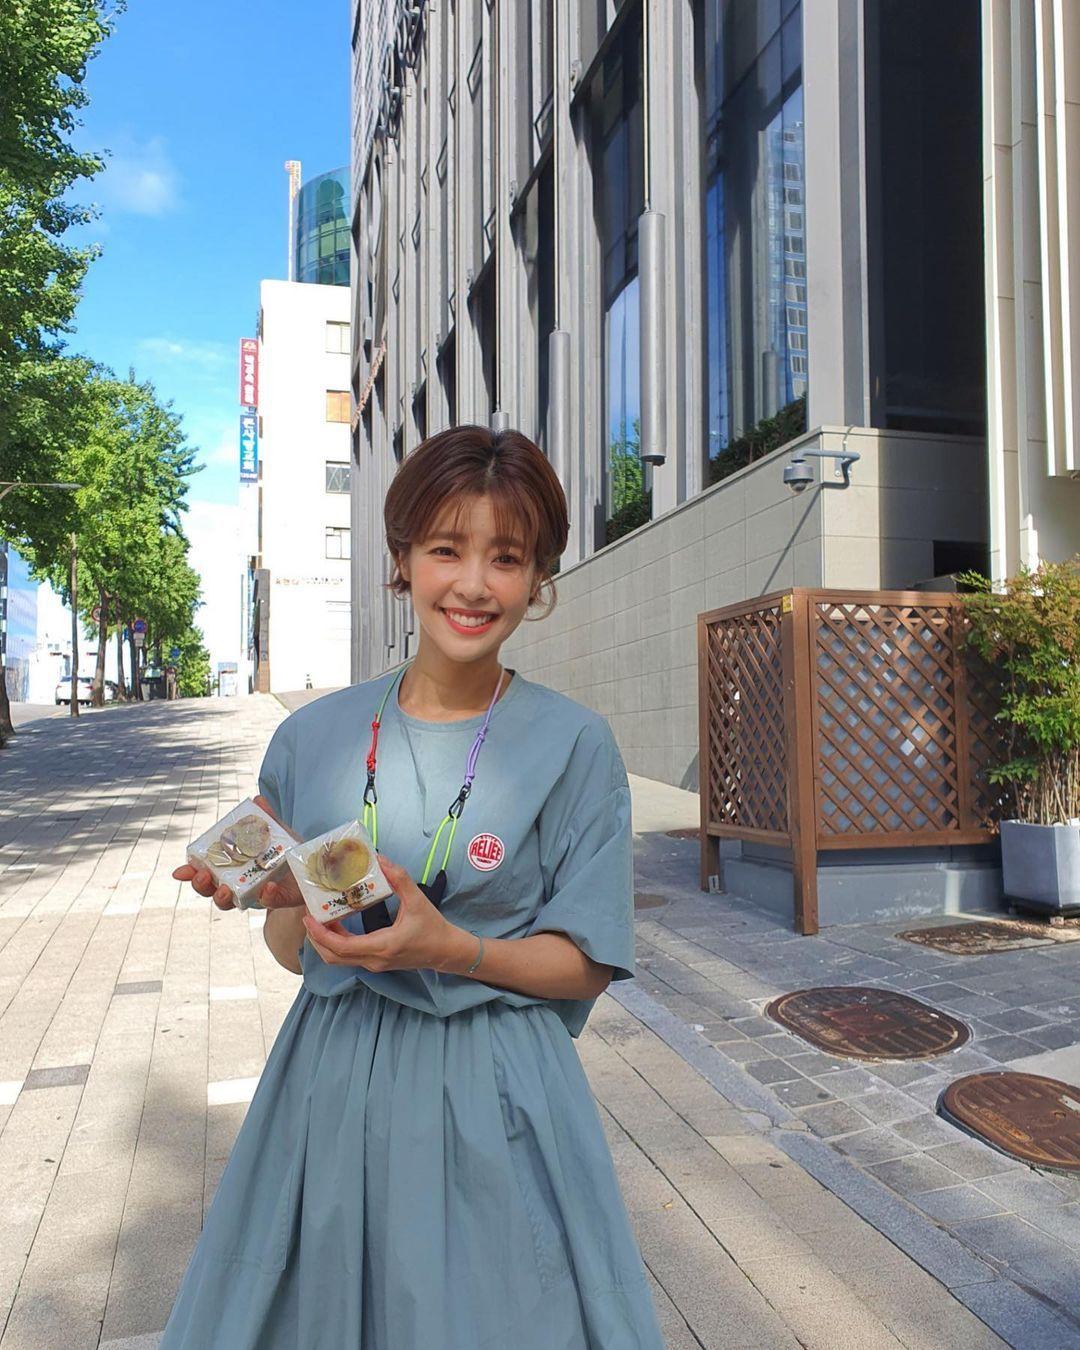 Penampilan Lee Yoon Ji pemeran Princess Hours kini